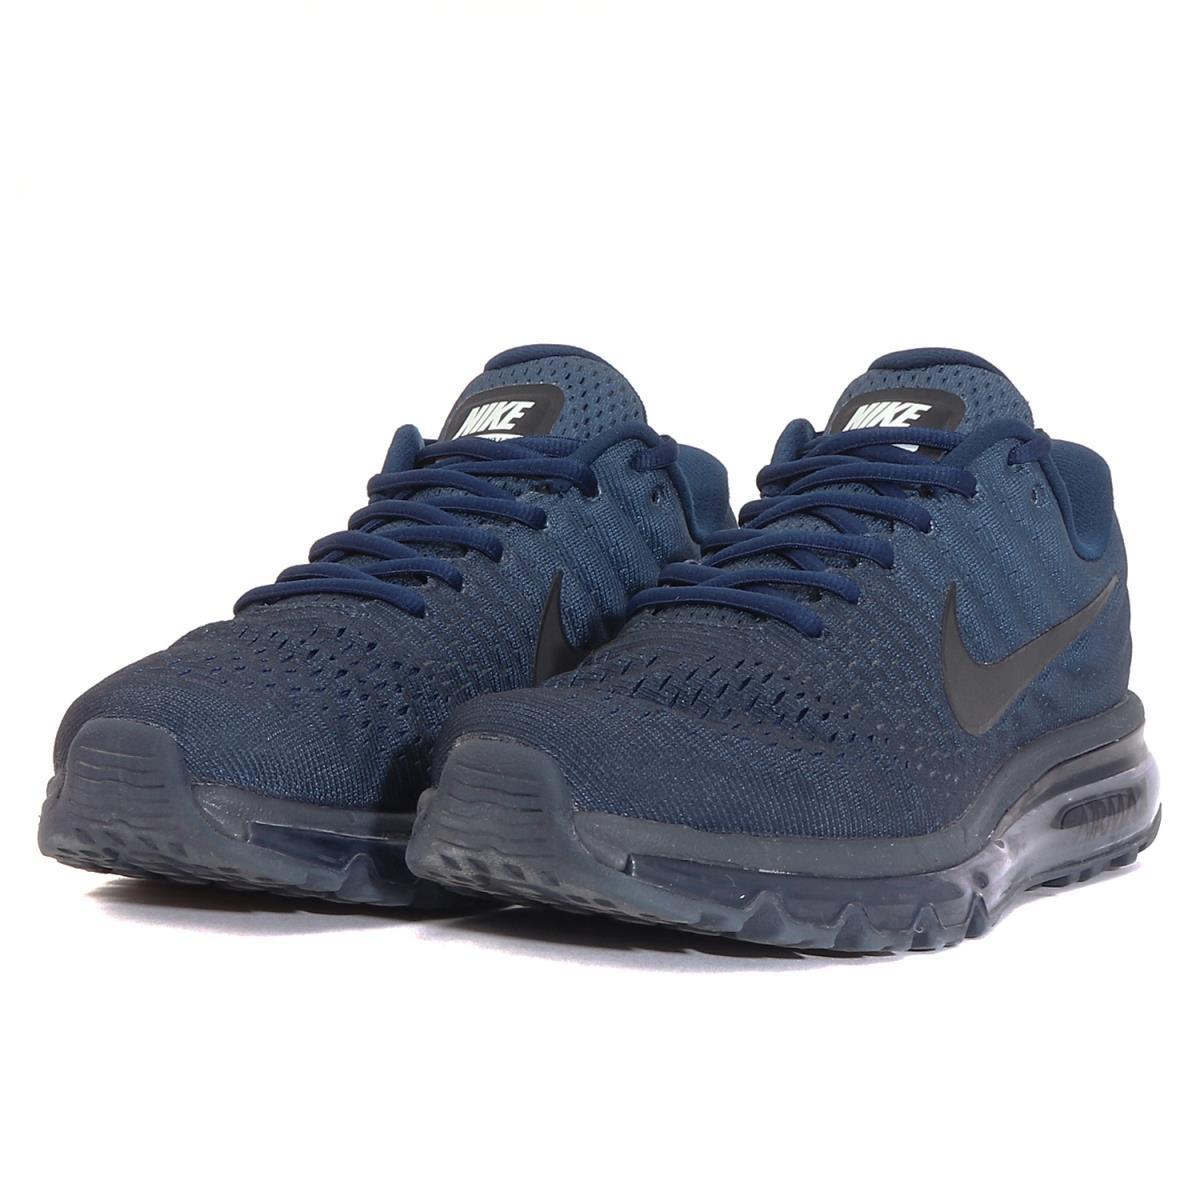 buy online a7ae8 67ee4 NIKE (Nike) AIR MAX 2017 (849,559-405) binary blue US8.5(26.5cm)